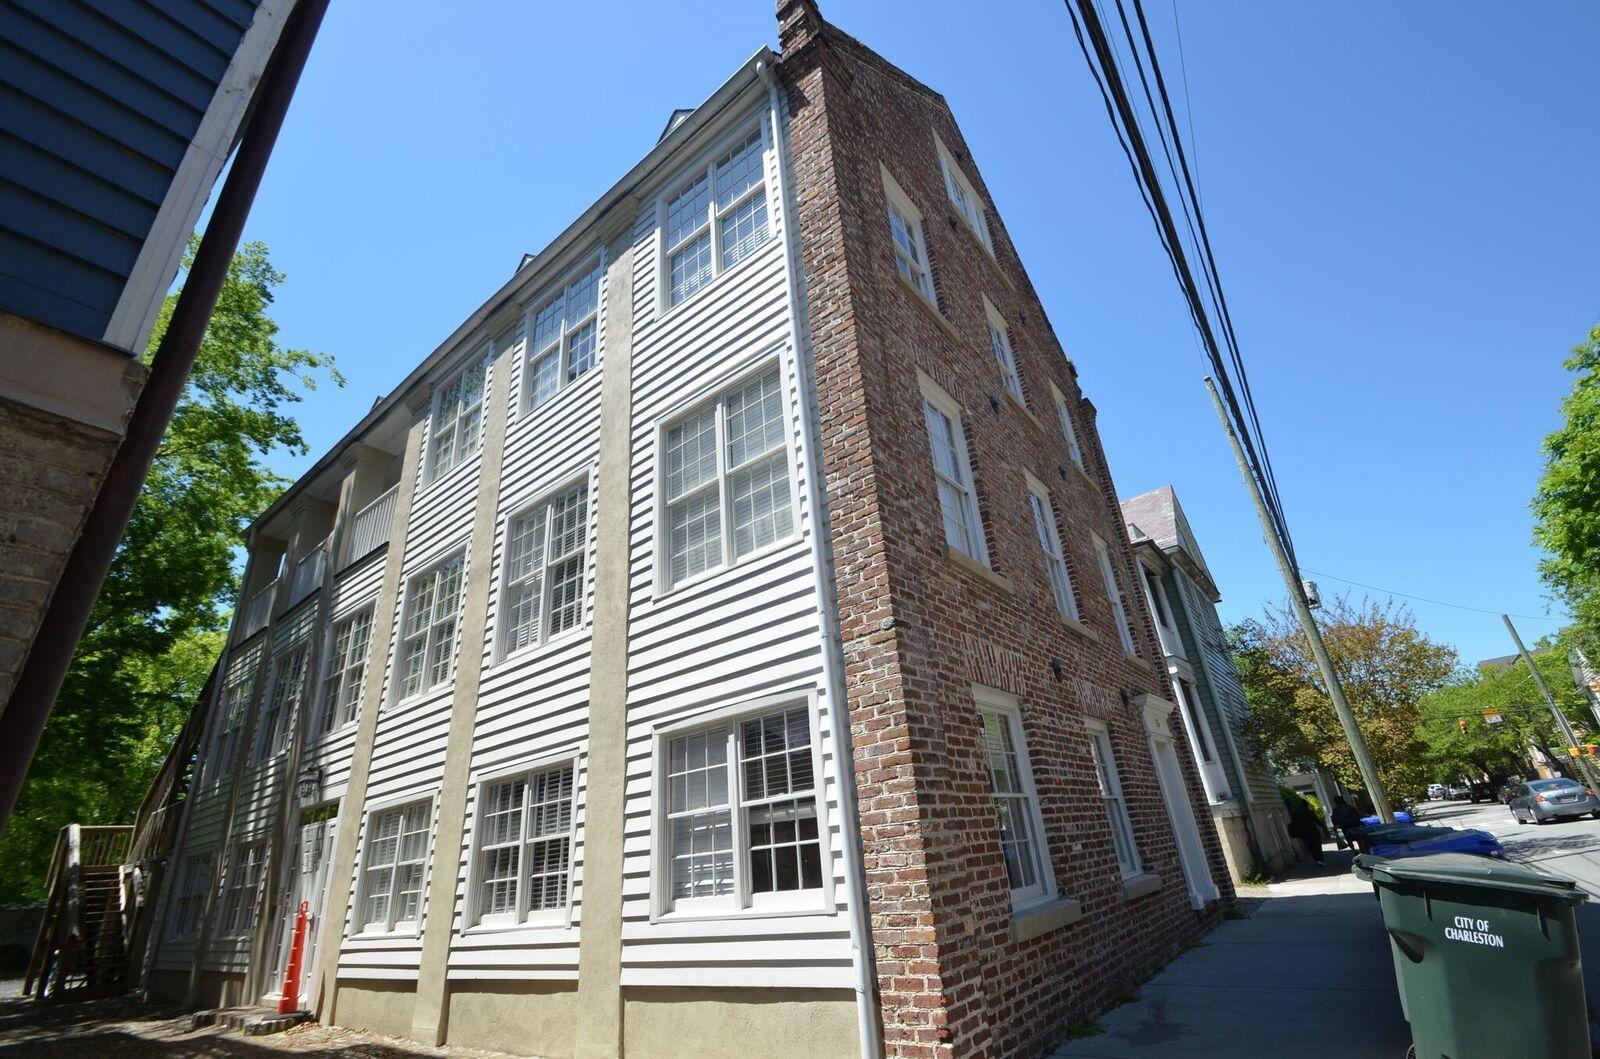 15 A Coming Street Charleston, SC 29401